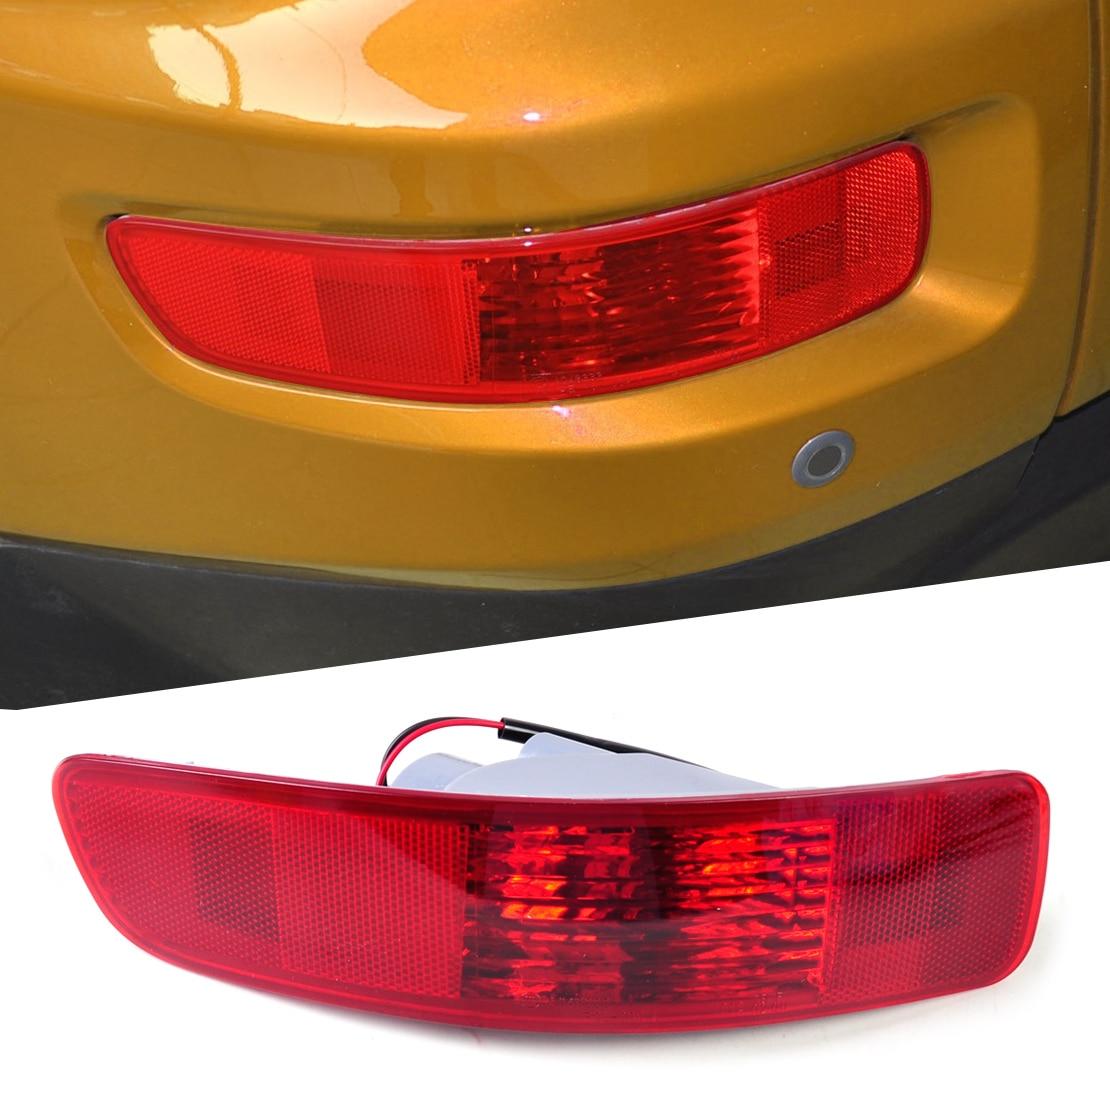 DWCX SL693-LH SL693 Rear Fog Lamp Light Left Side for Mitsubishi Outlander 2007 2008 2009 2010 2011 2012 2013 car rear trunk security shield shade cargo cover for nissan qashqai 2008 2009 2010 2011 2012 2013 black beige